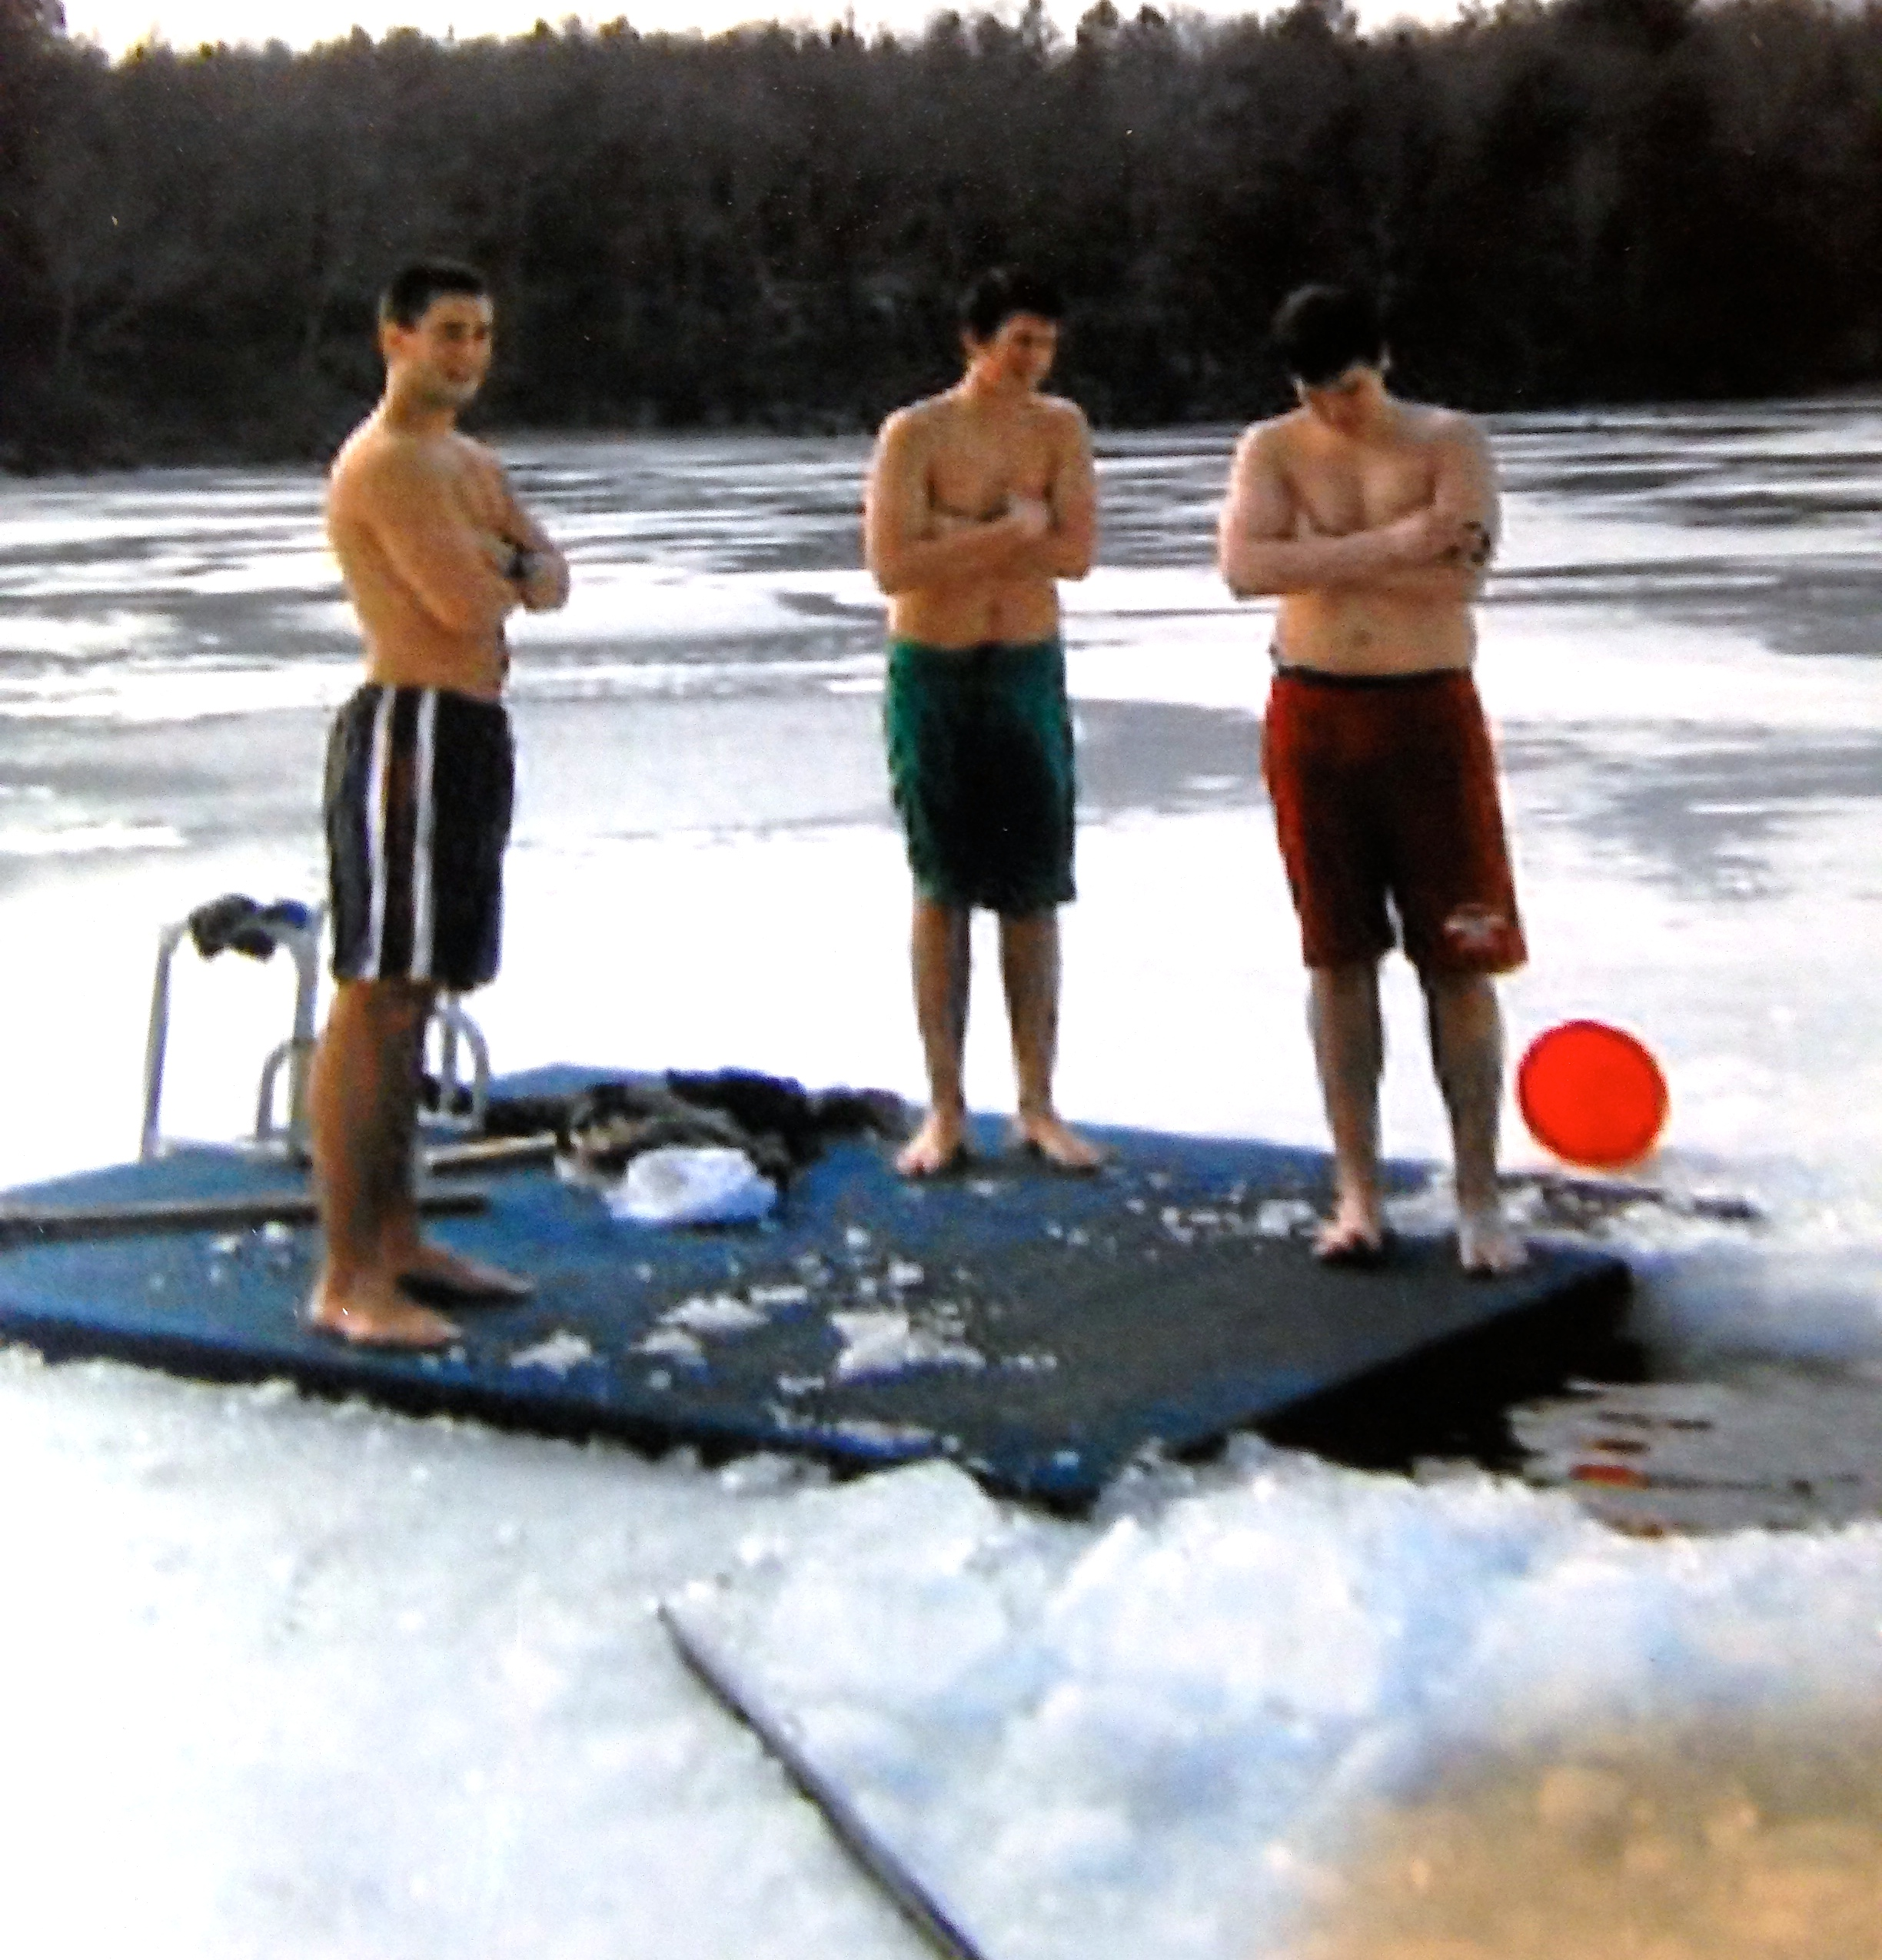 the annual plunge into a frozen Lake Quassapaug